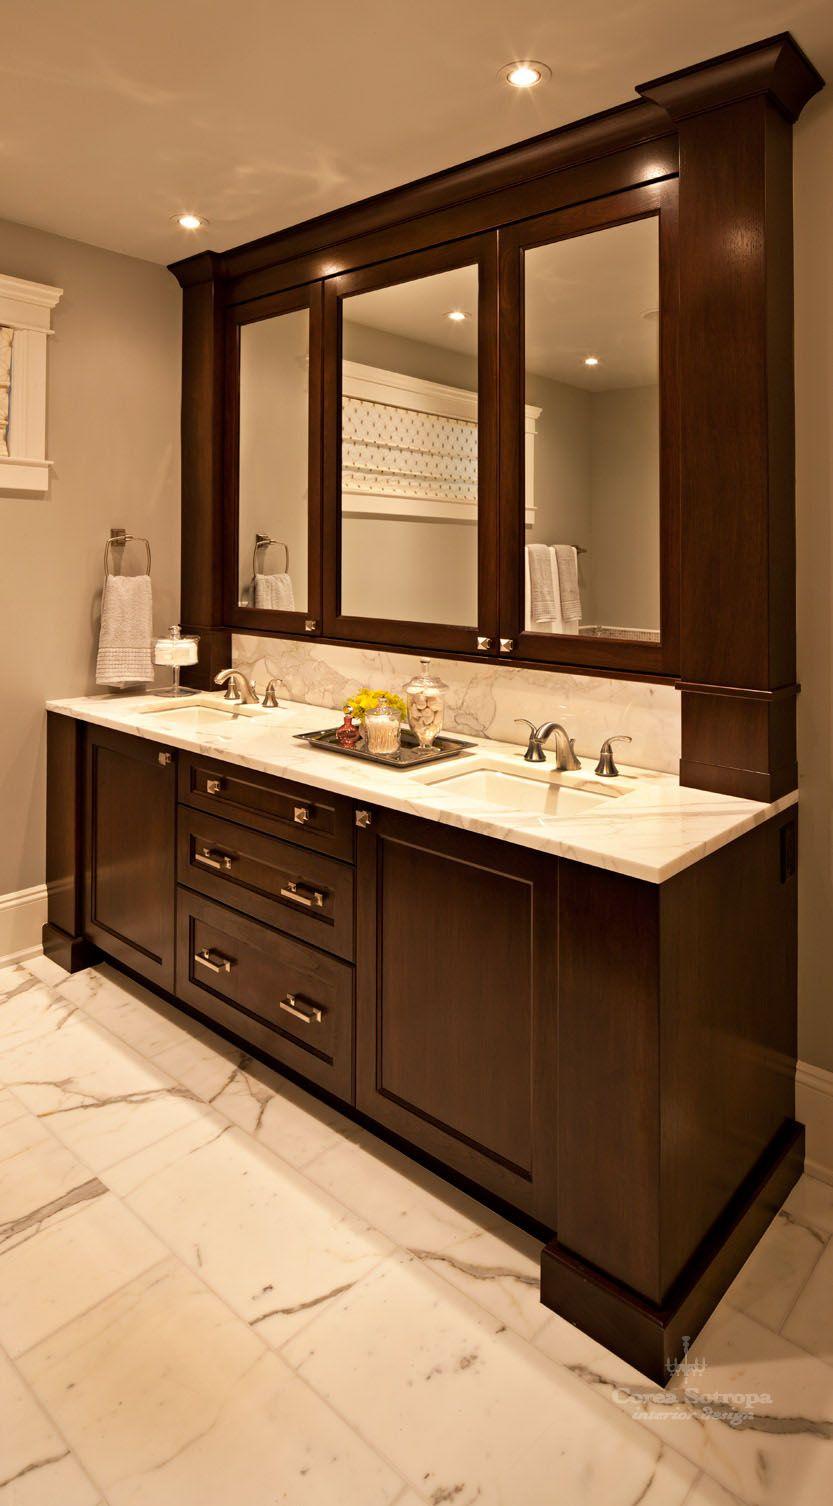 Calgary Interior Designer With Images Bathroom Design